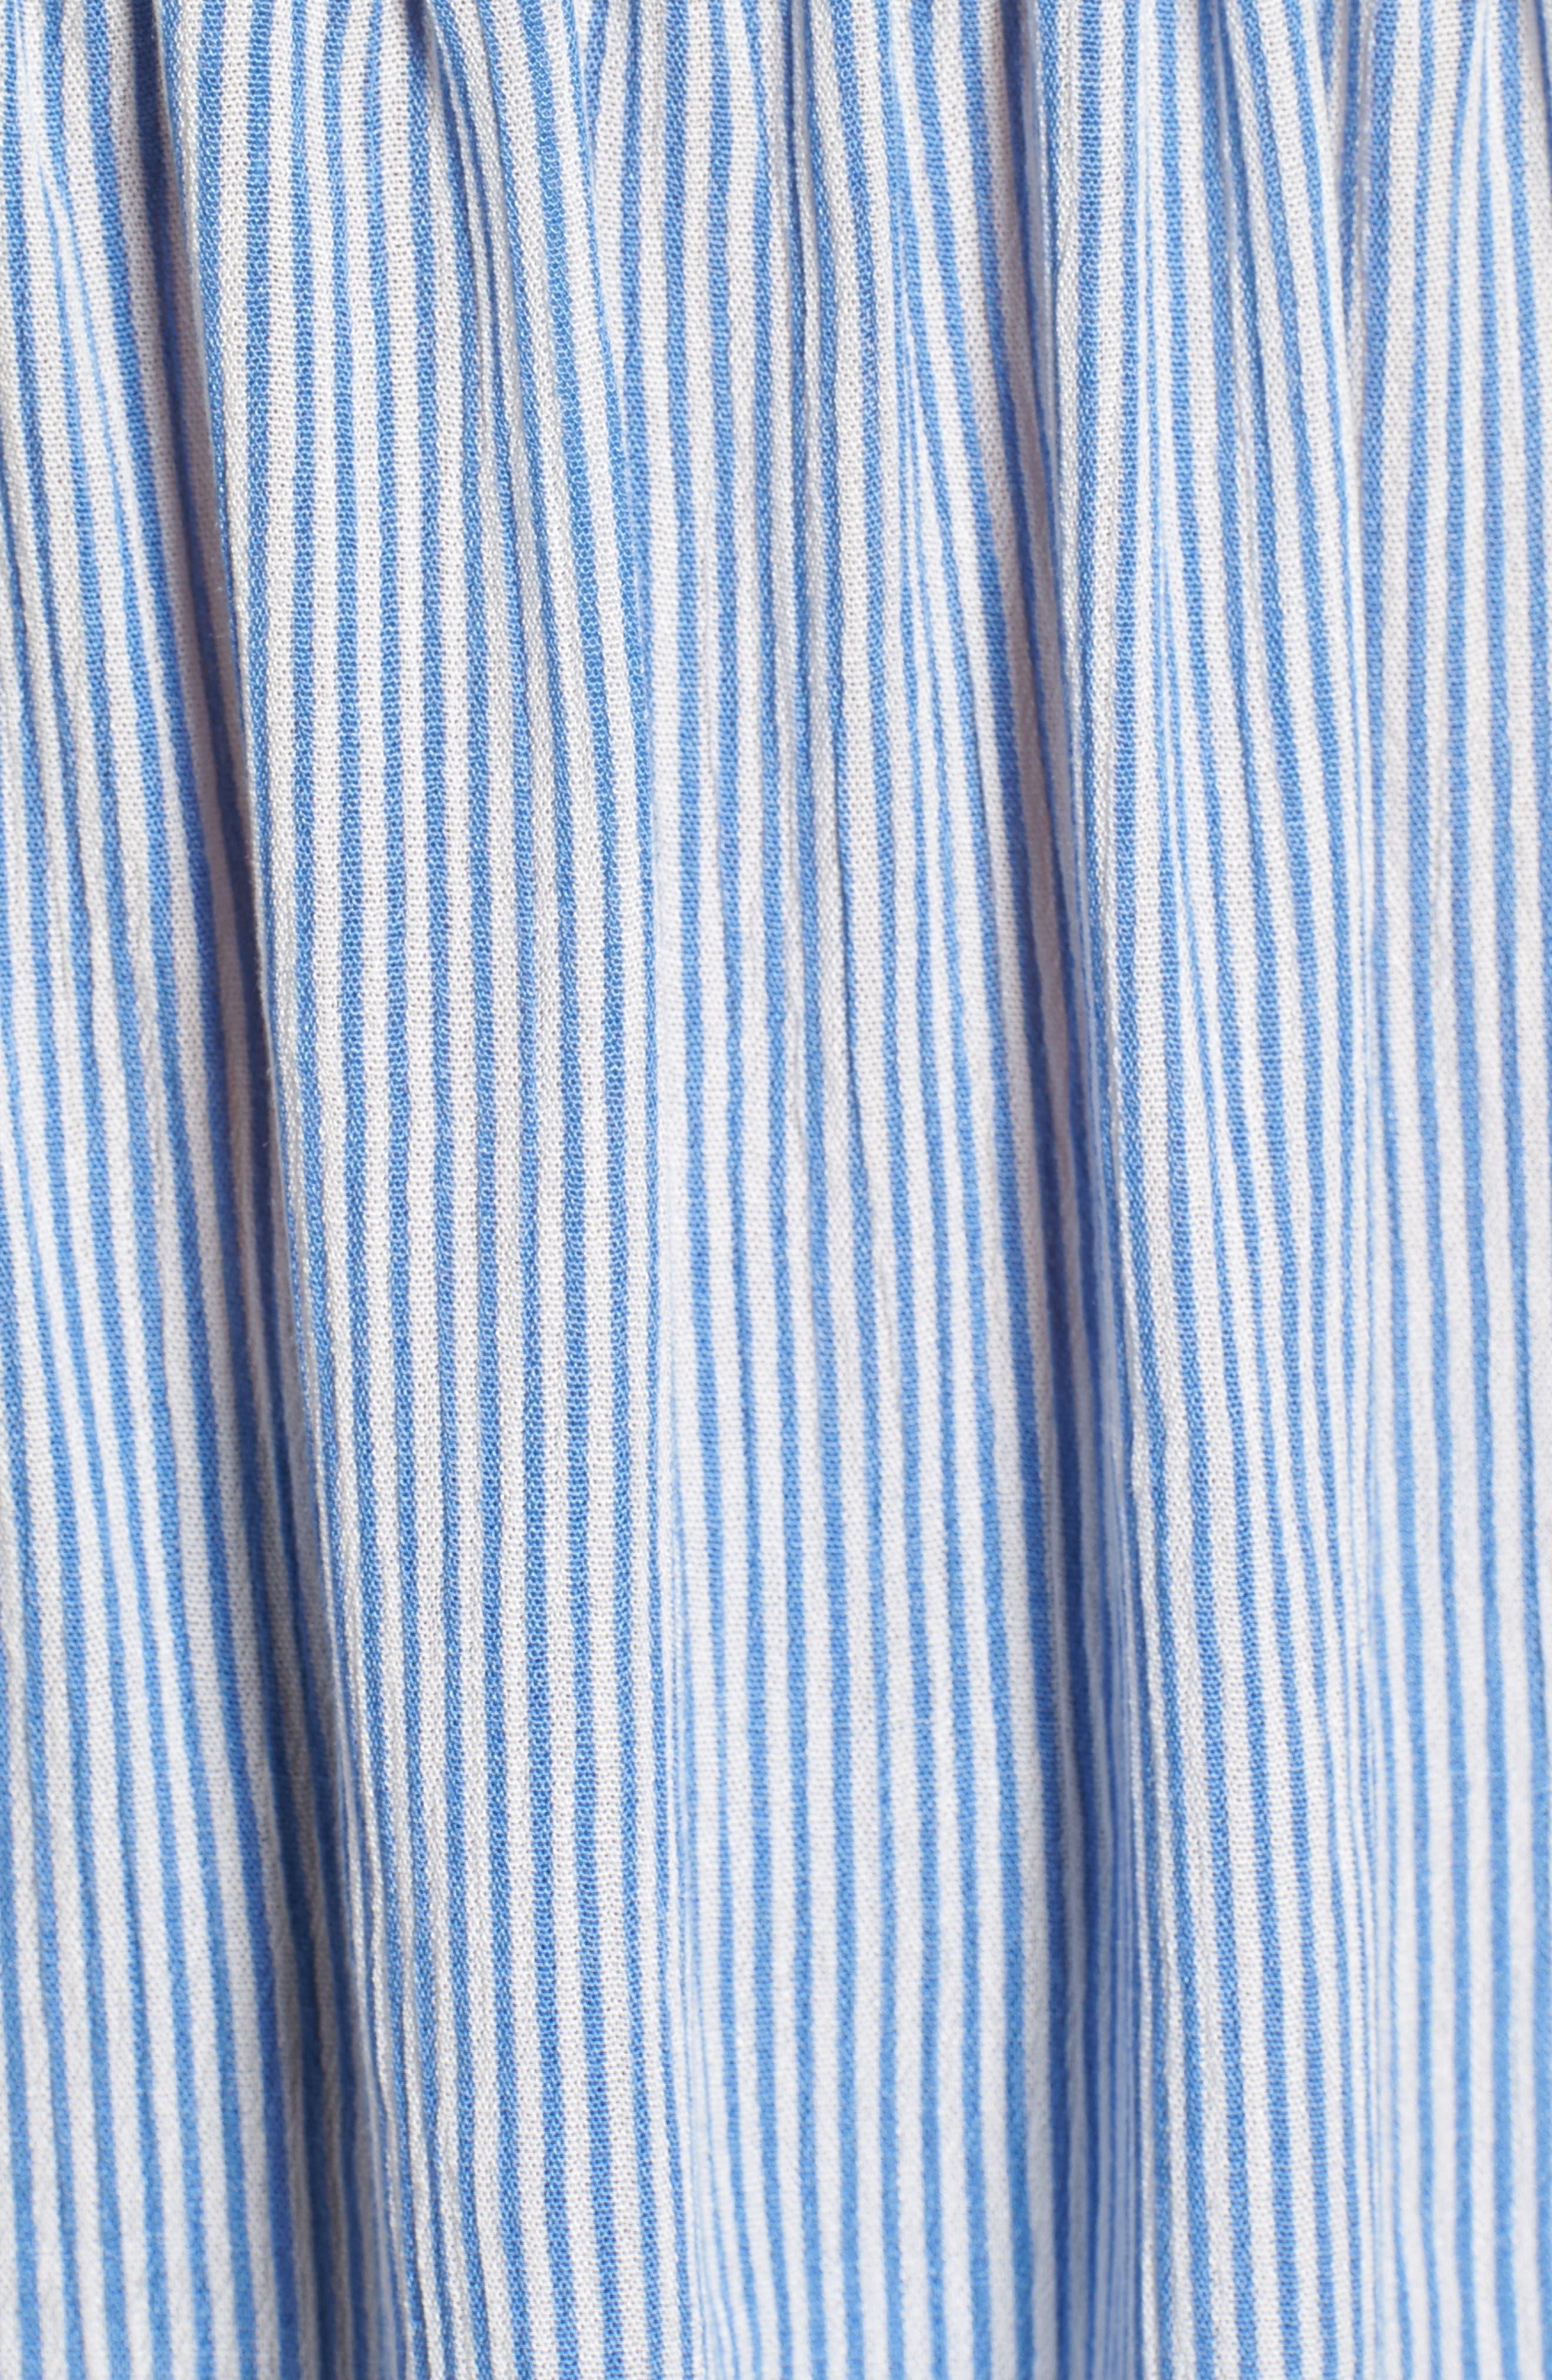 Mixed Stripe Tie Back Top,                             Alternate thumbnail 6, color,                             Blue Bell Devan Stripe